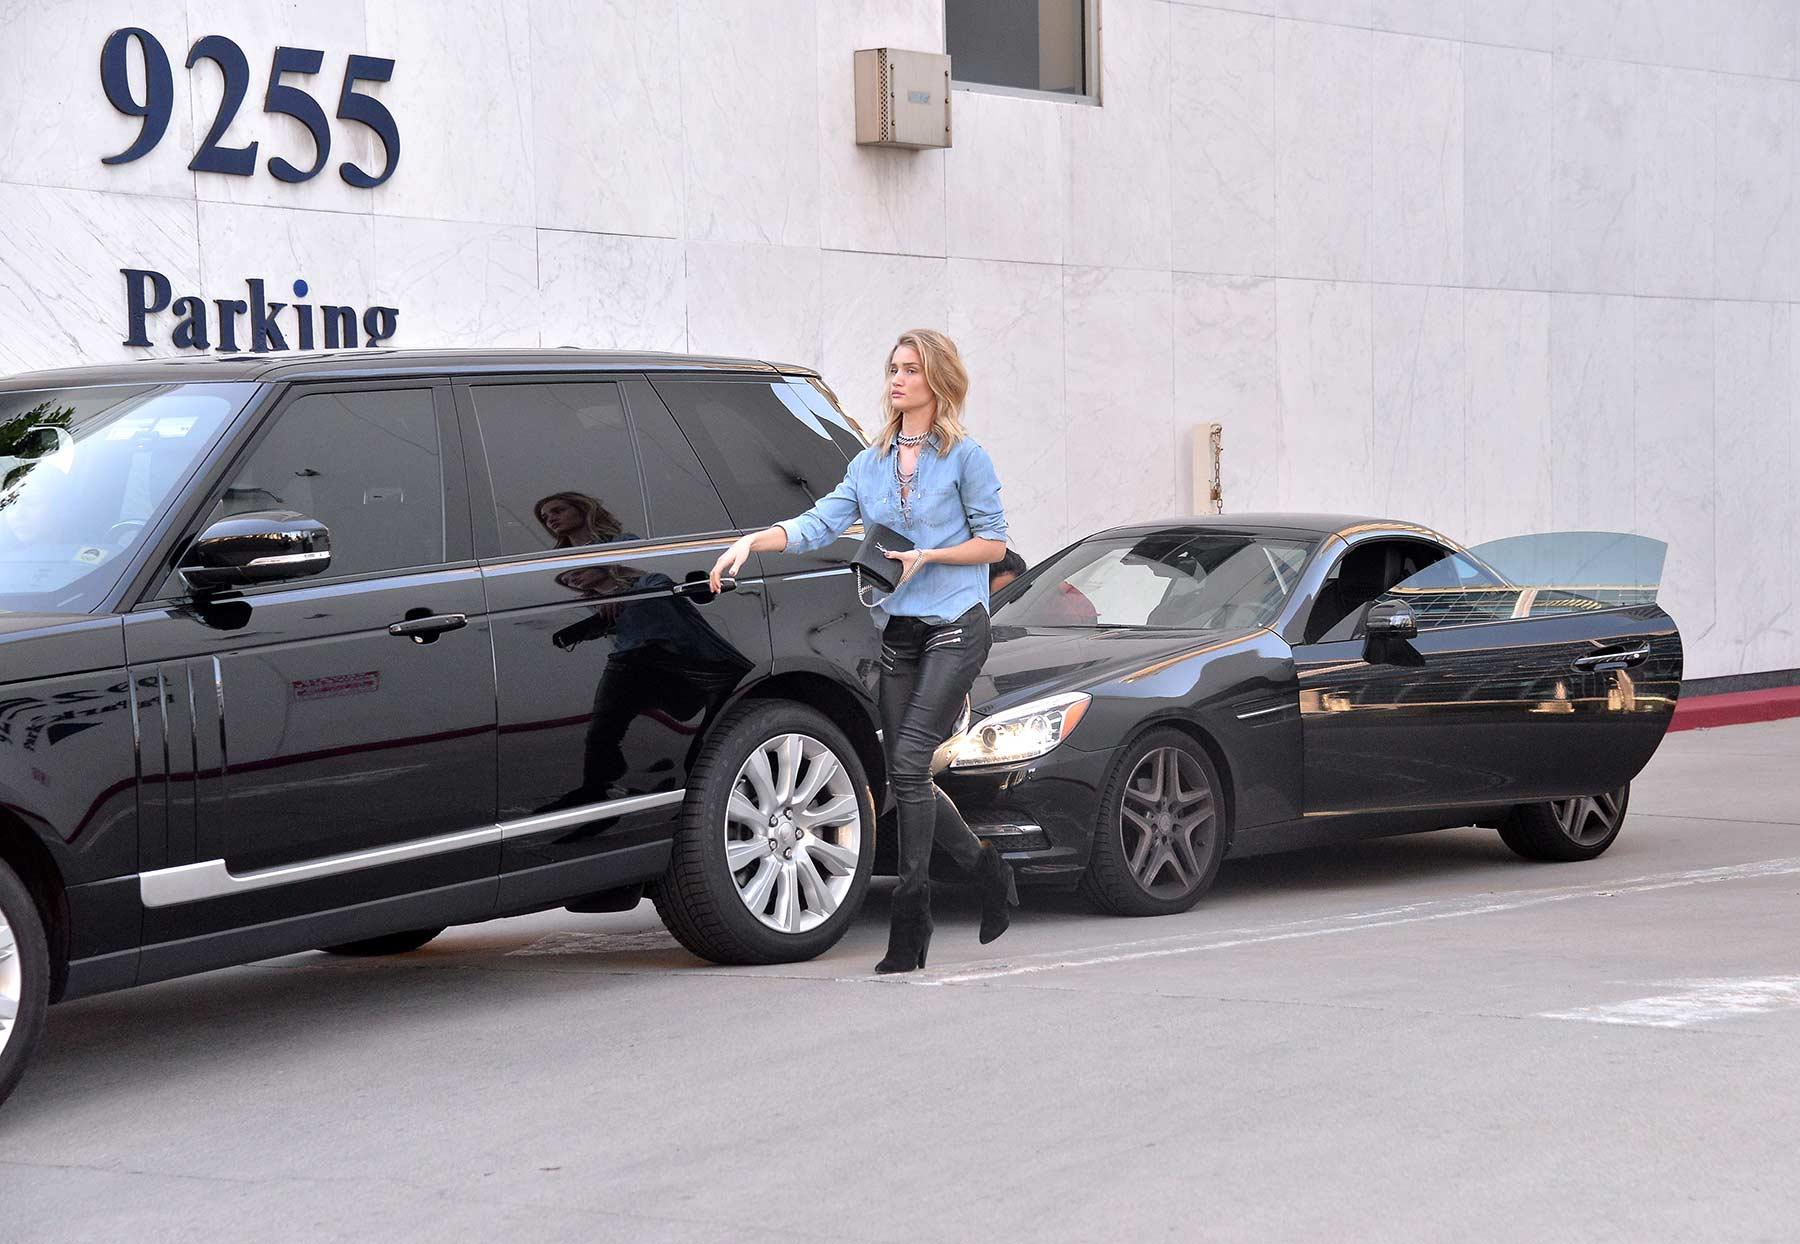 Rosie Huntington-Whiteley has a Car Accident